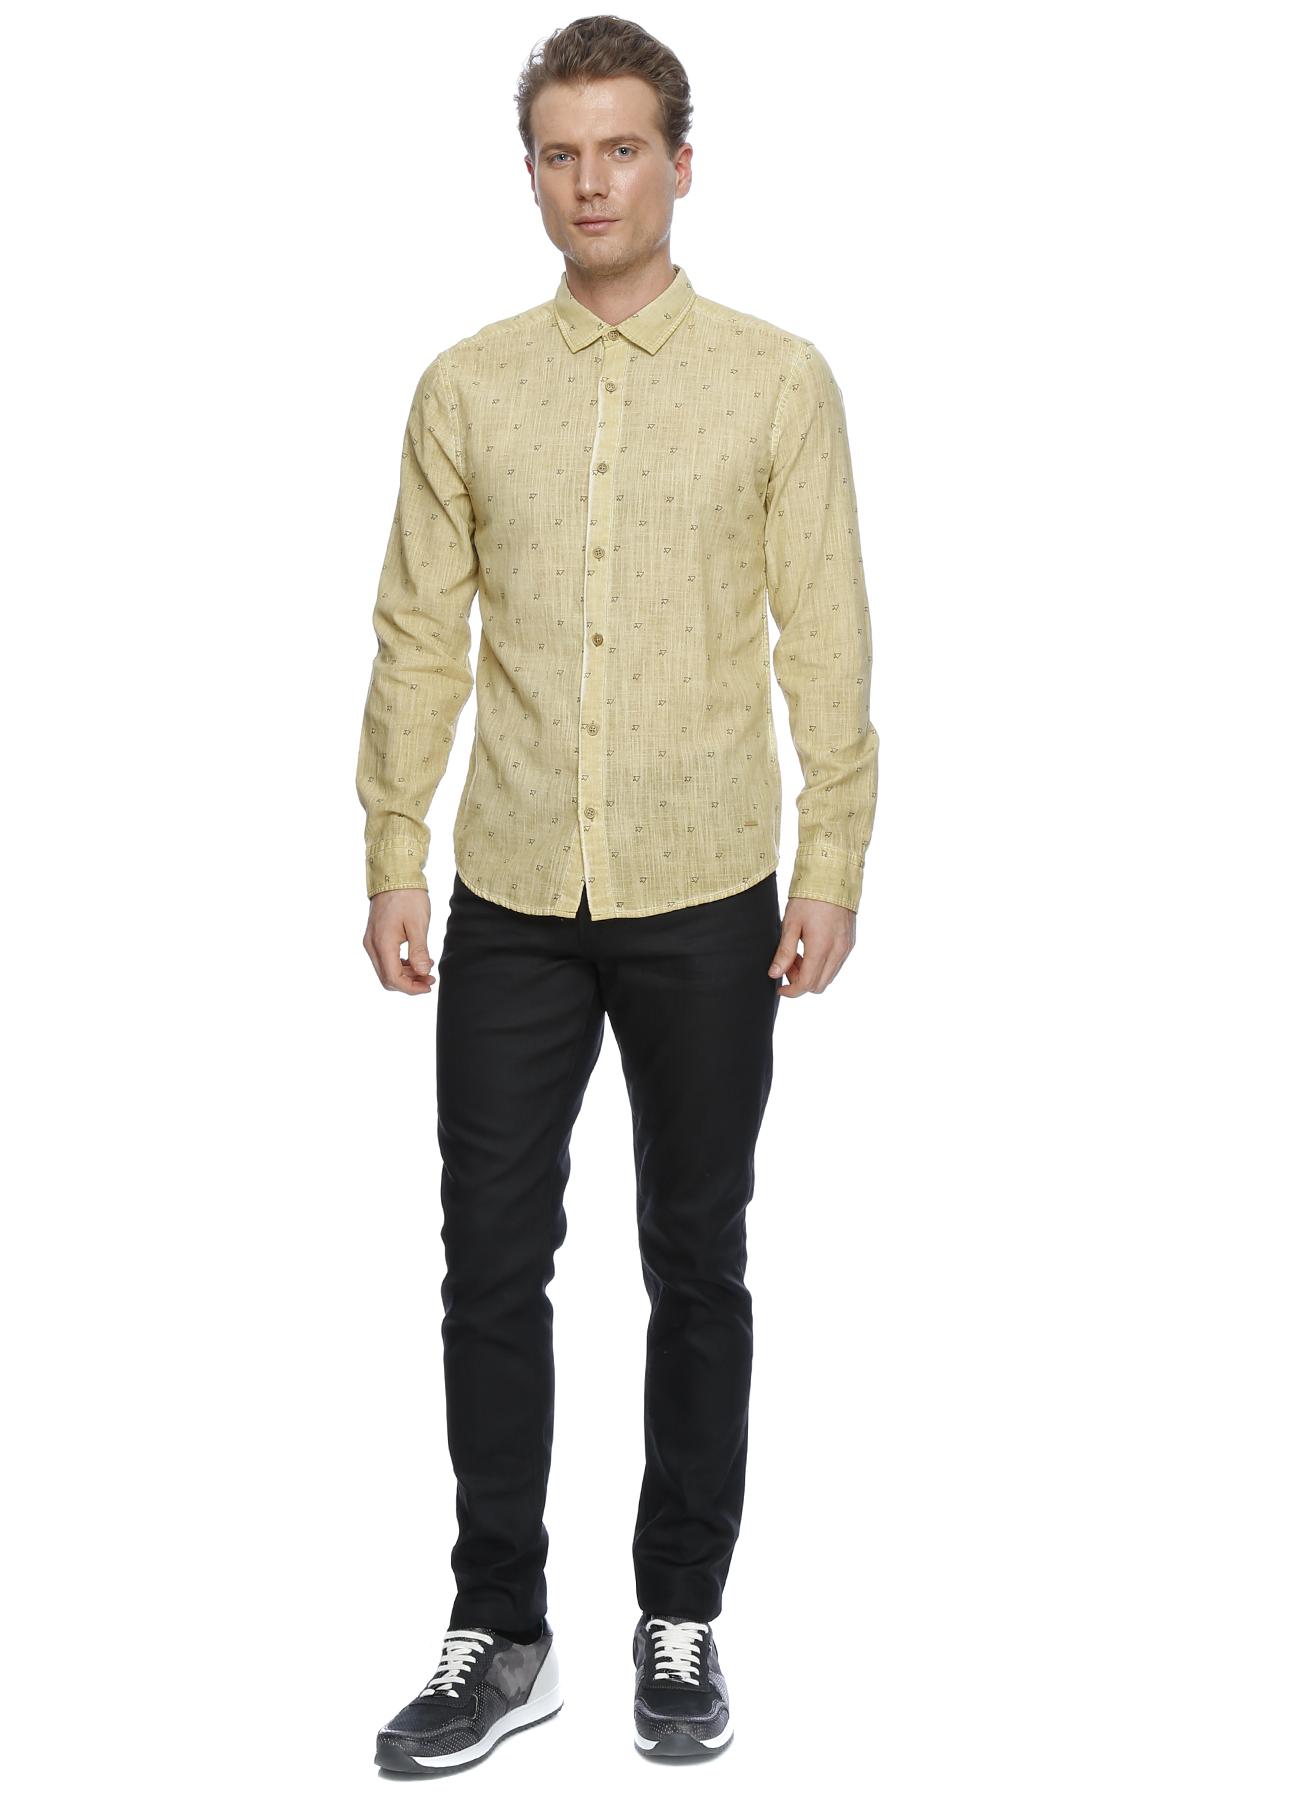 Loft Slim Fit Klasik Pantolon 32-30 5000195125007 Ürün Resmi